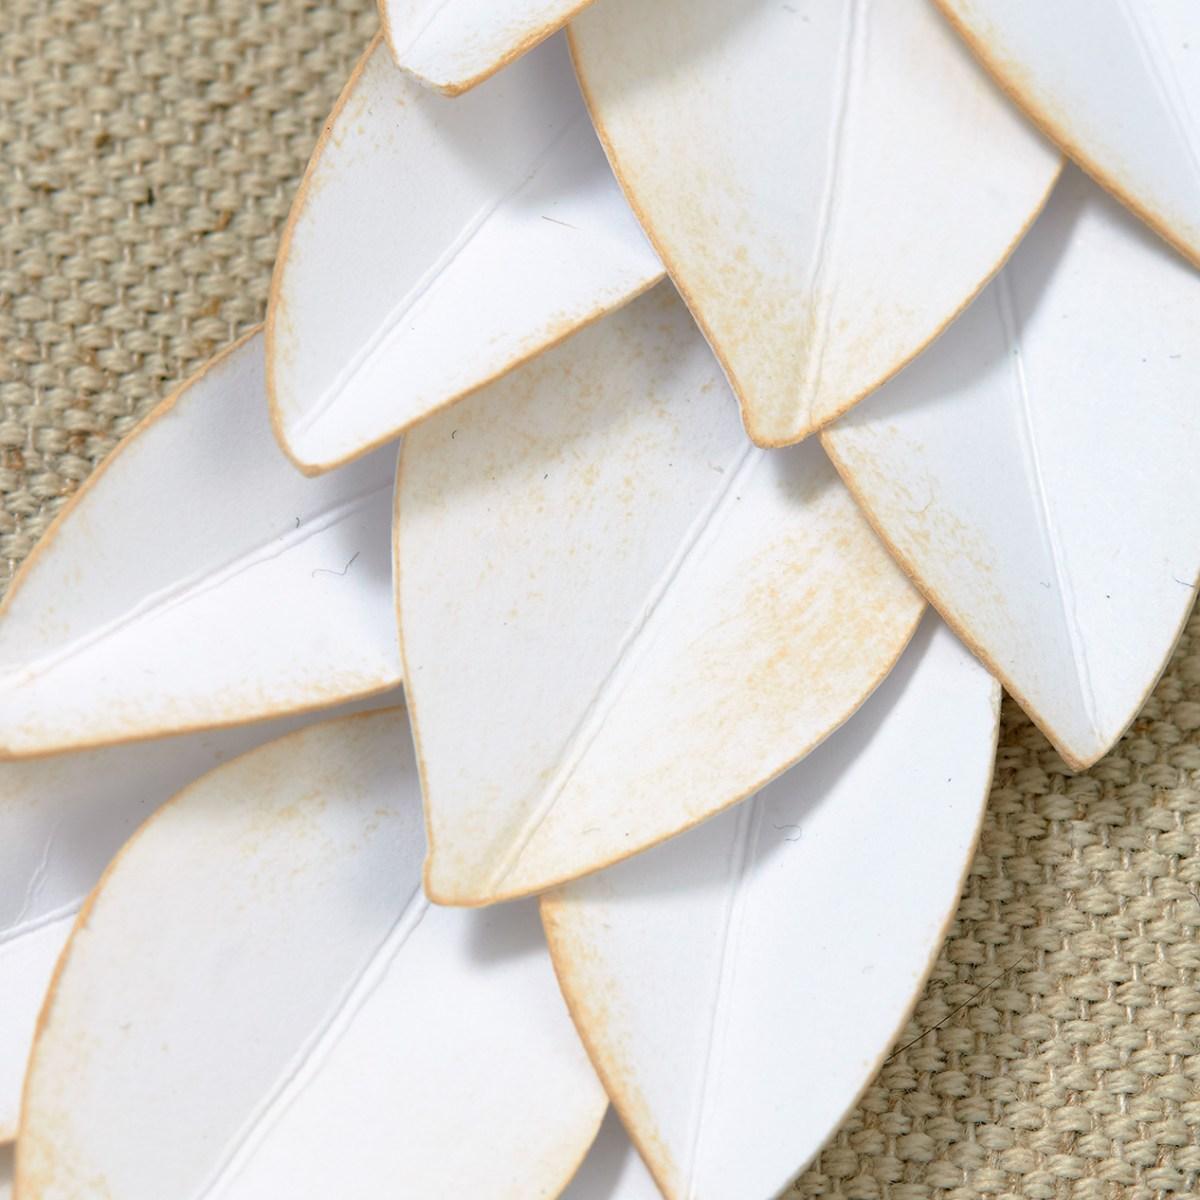 Wreath Up Close #ctmh #closetomyheart #wreath #monogrammedwreath #monogramwreath #monogram #neutral #antiqued #modernantique #shabbychic #distressed #distressingtechnique #diy